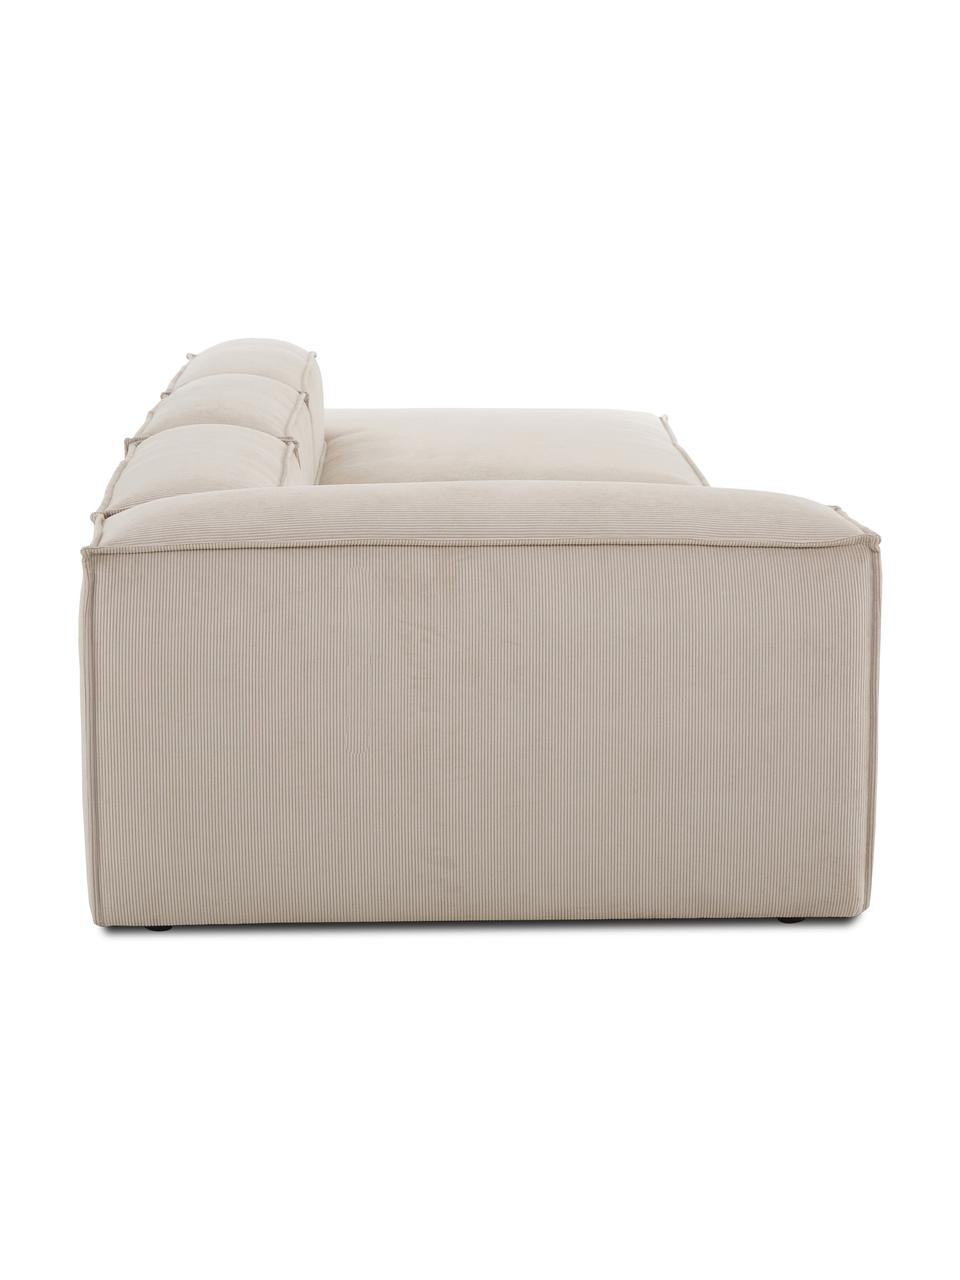 Modulaire XL chaise longue Lennon in beige van corduroy, Bekleding: corduroy (92% polyester, , Frame: massief grenenhout, multi, Poten: kunststof De poten bevind, Corduroy beige, B 357 x D 119 cm